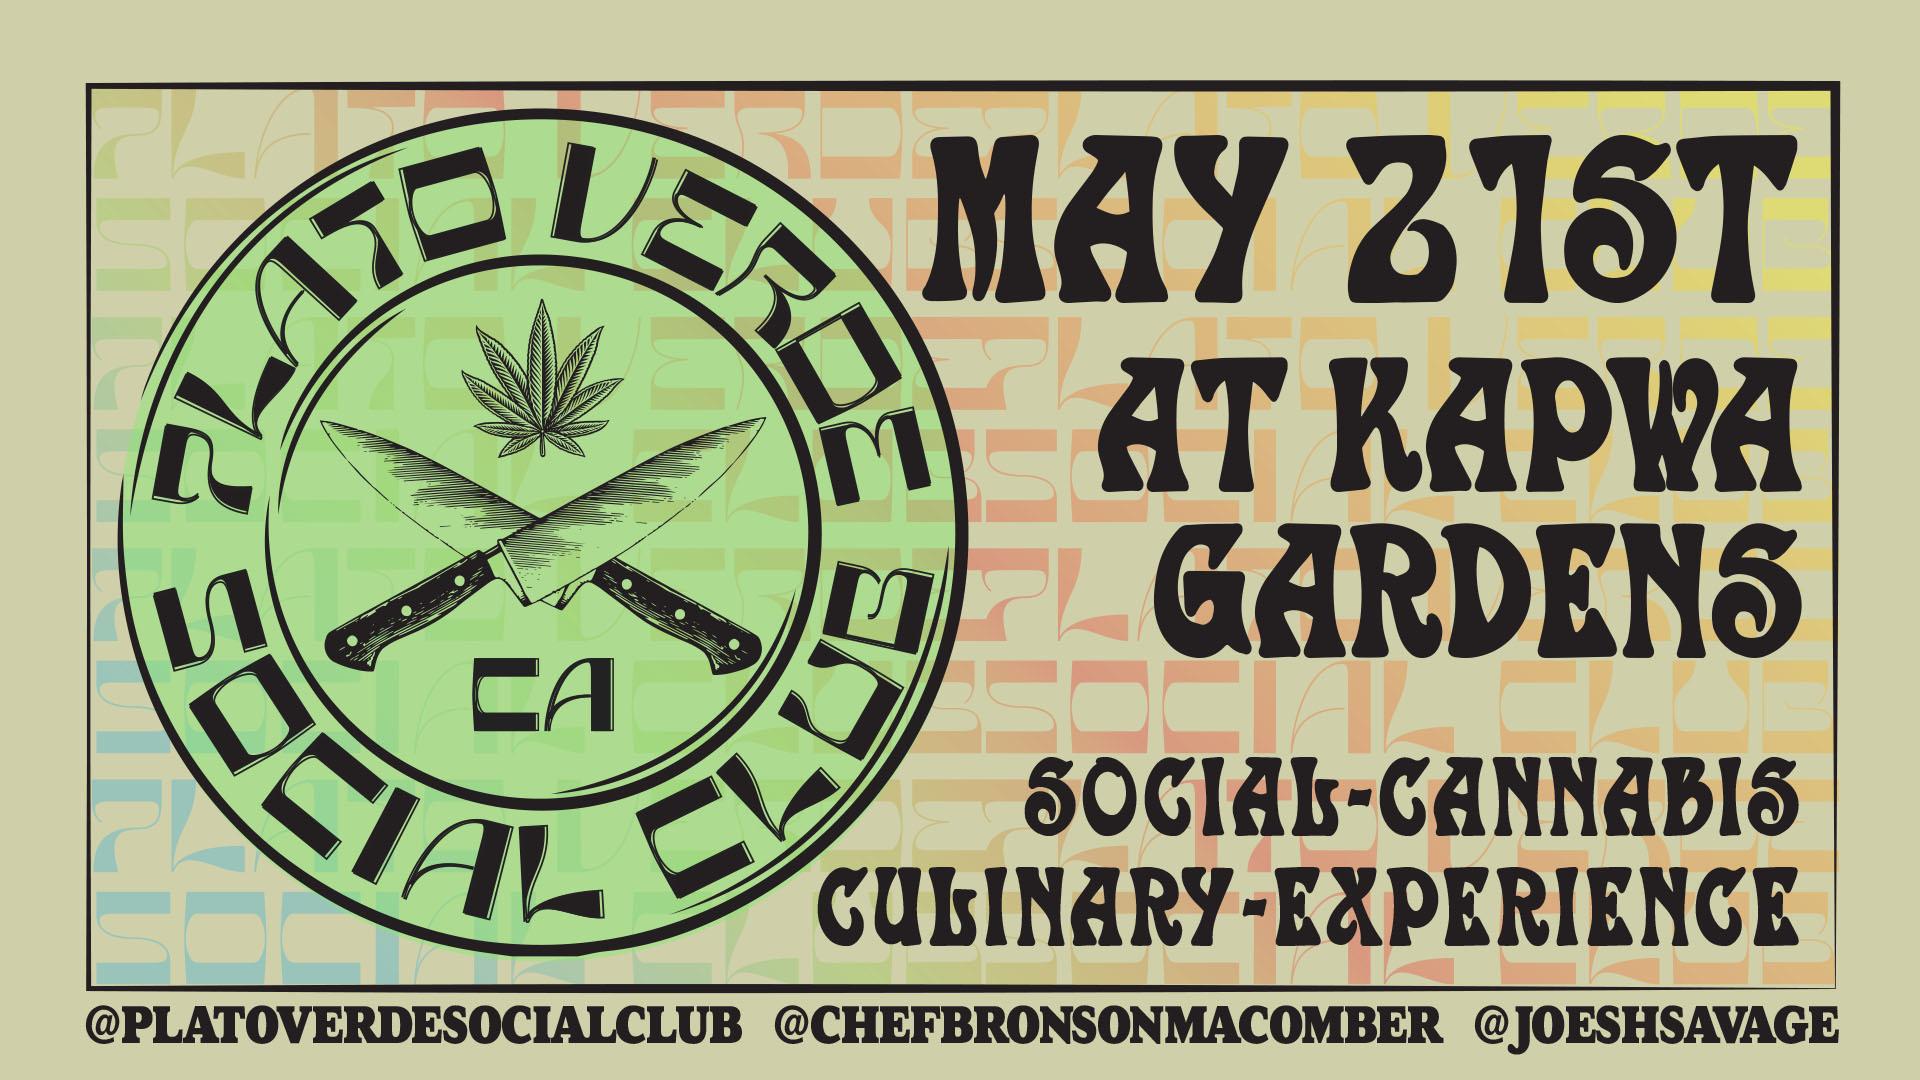 Plato Verde Social Club / Social Cannabis Culinary Experience